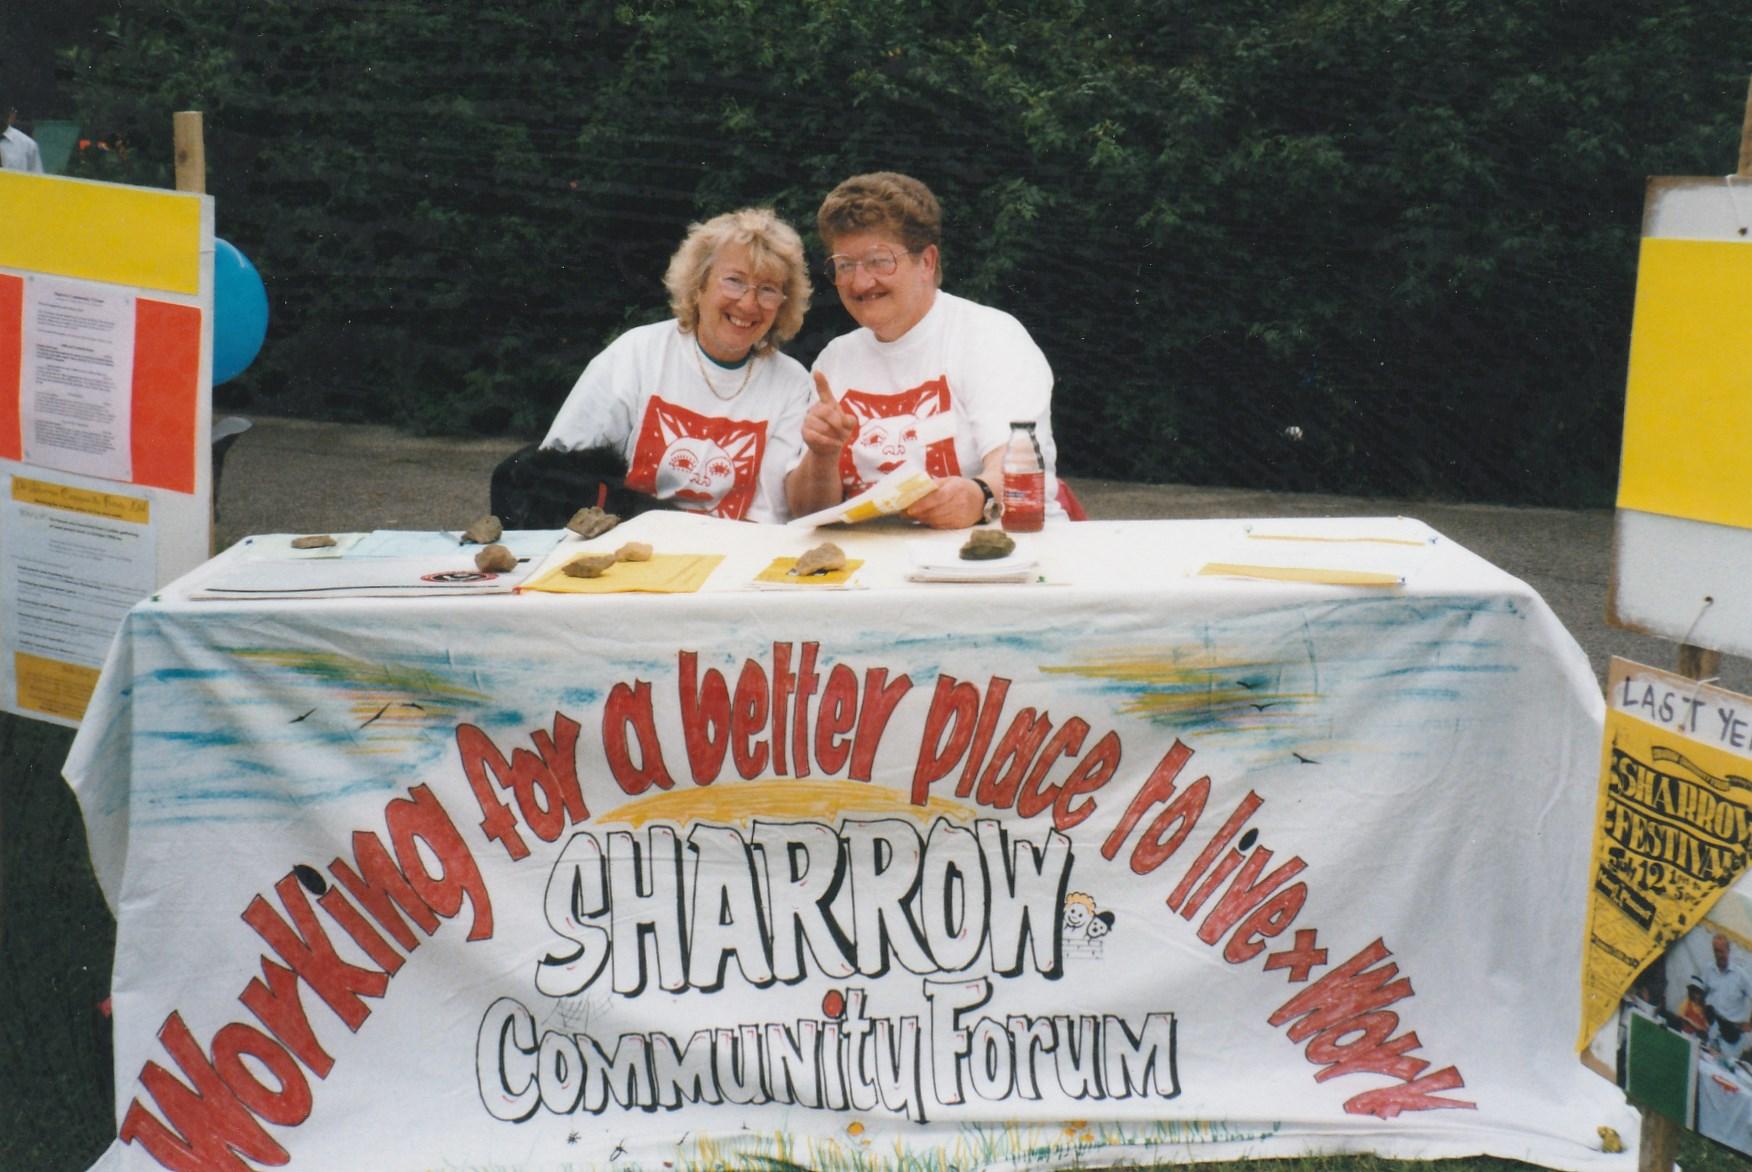 Ann Wilson on the right at the 1998 Sharrow Festival - Ann Wilson on the right at the 1998 Sharrow Festival